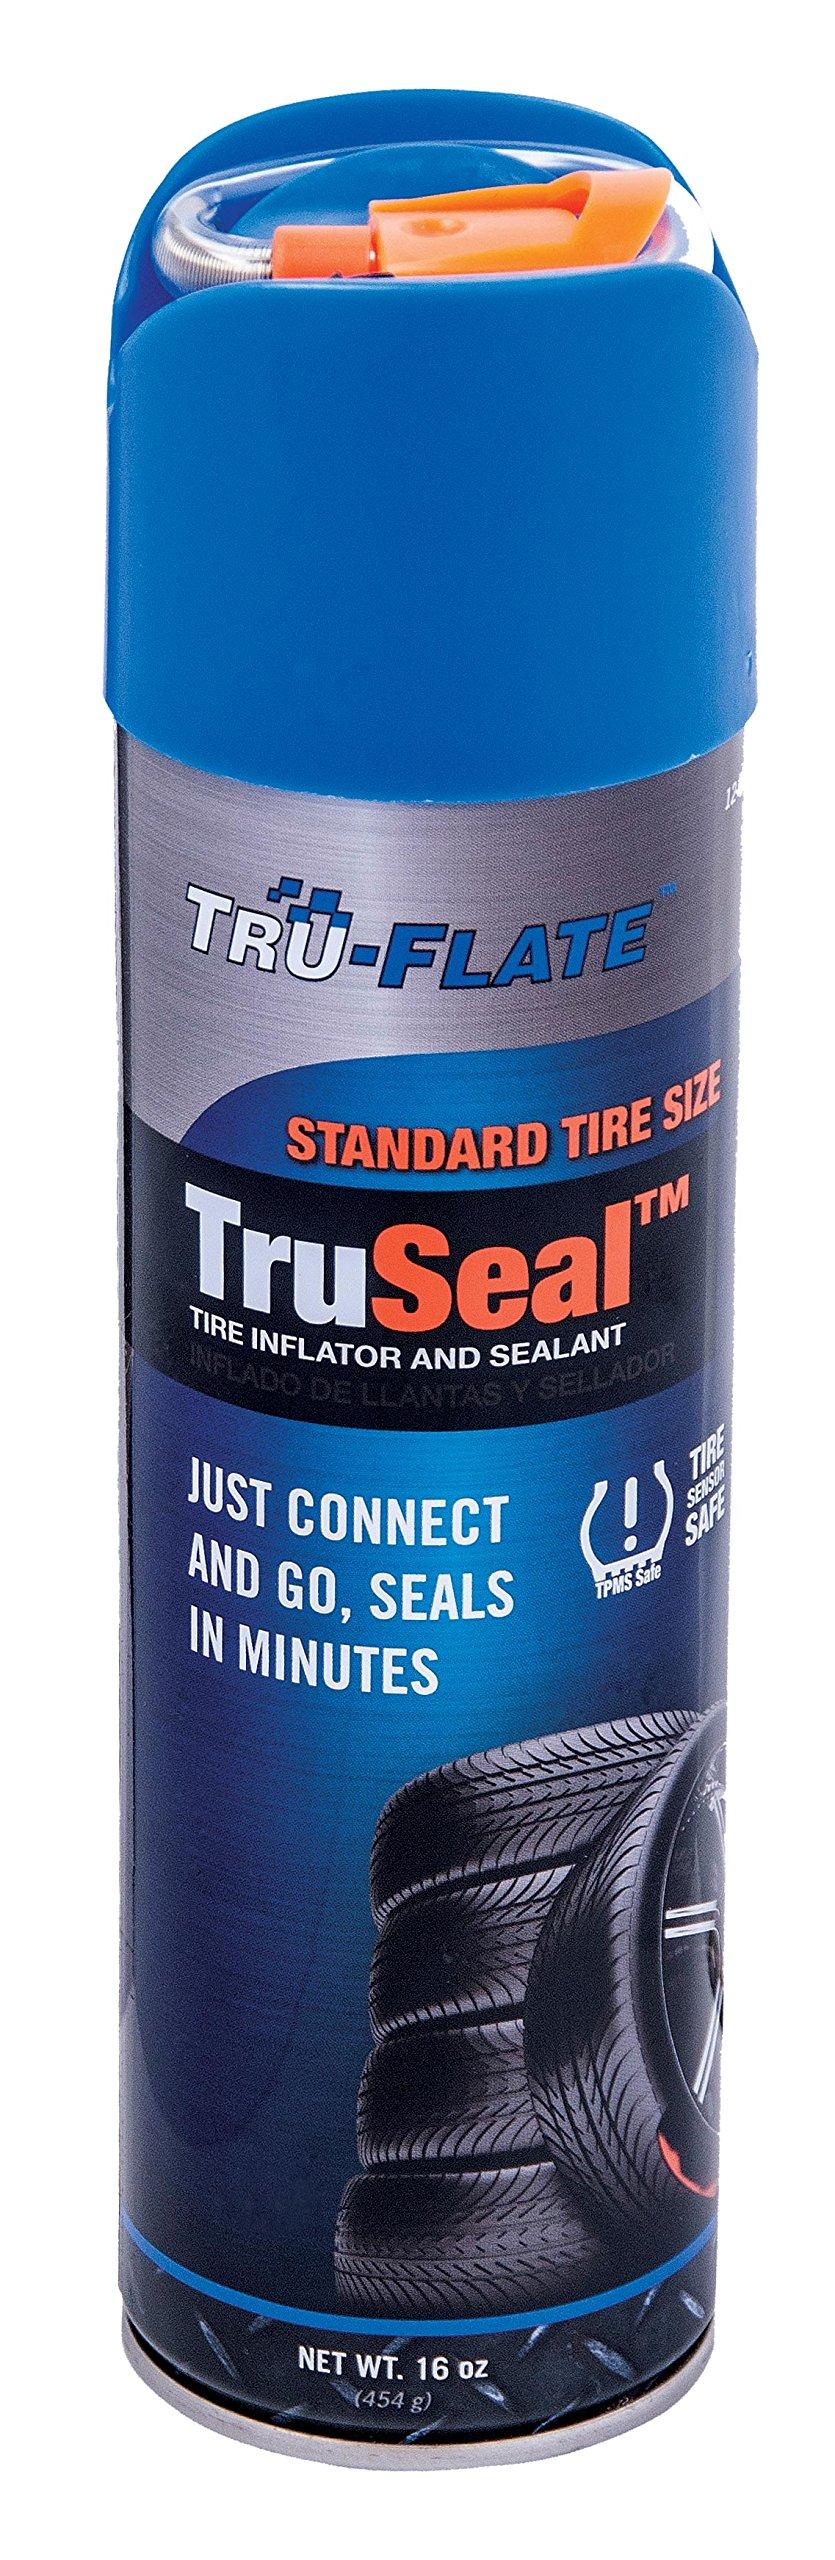 Tru-Flate 12-073 16 Oz. Truseal' Tire Sealant Aerosol